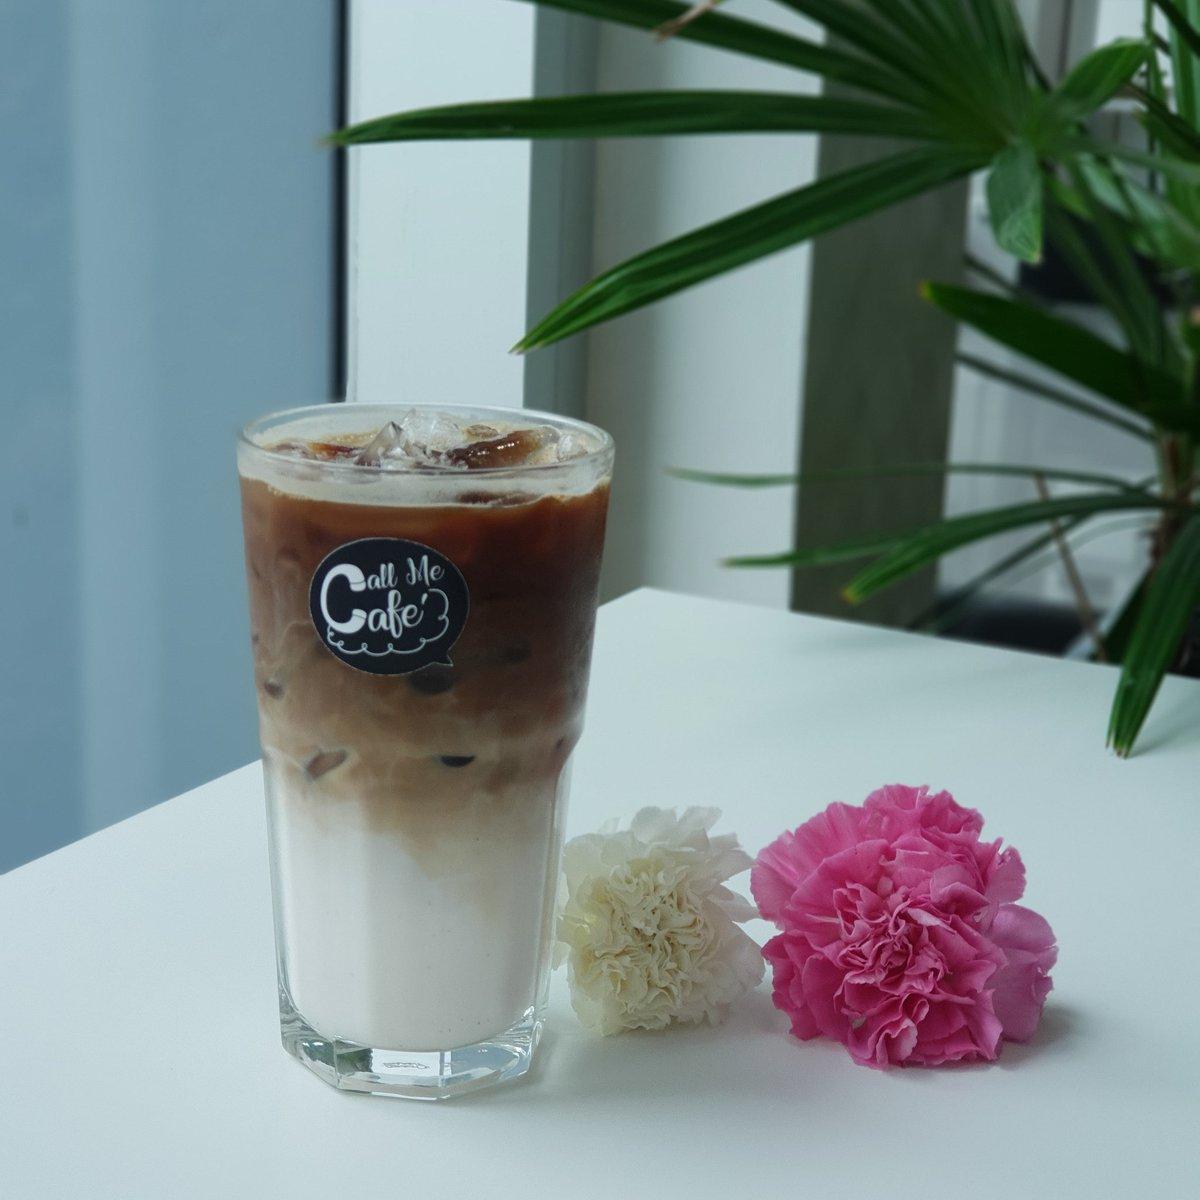 Rose Latte หอมกุหลาบมากๆ  ชั้น2 ตึกเทเลวิซ เดินเข้ามาทางซัมซุงแล้วขึ้นมาชั้น2เลยจ้า  เปิดทุกวัน 8.30-17.30 ลูกค้า Ais ลด10บาททุกเมนูเครื่องดื่ม ลูกค้า Dtac ซื้อ2 แก้วลด10บาท  #callmecafe #รีวิวอุดร #รีวิวอีสาน #reviewudon #cafeudonthani #udonthani #roselattepic.twitter.com/be4R9fWuQ6